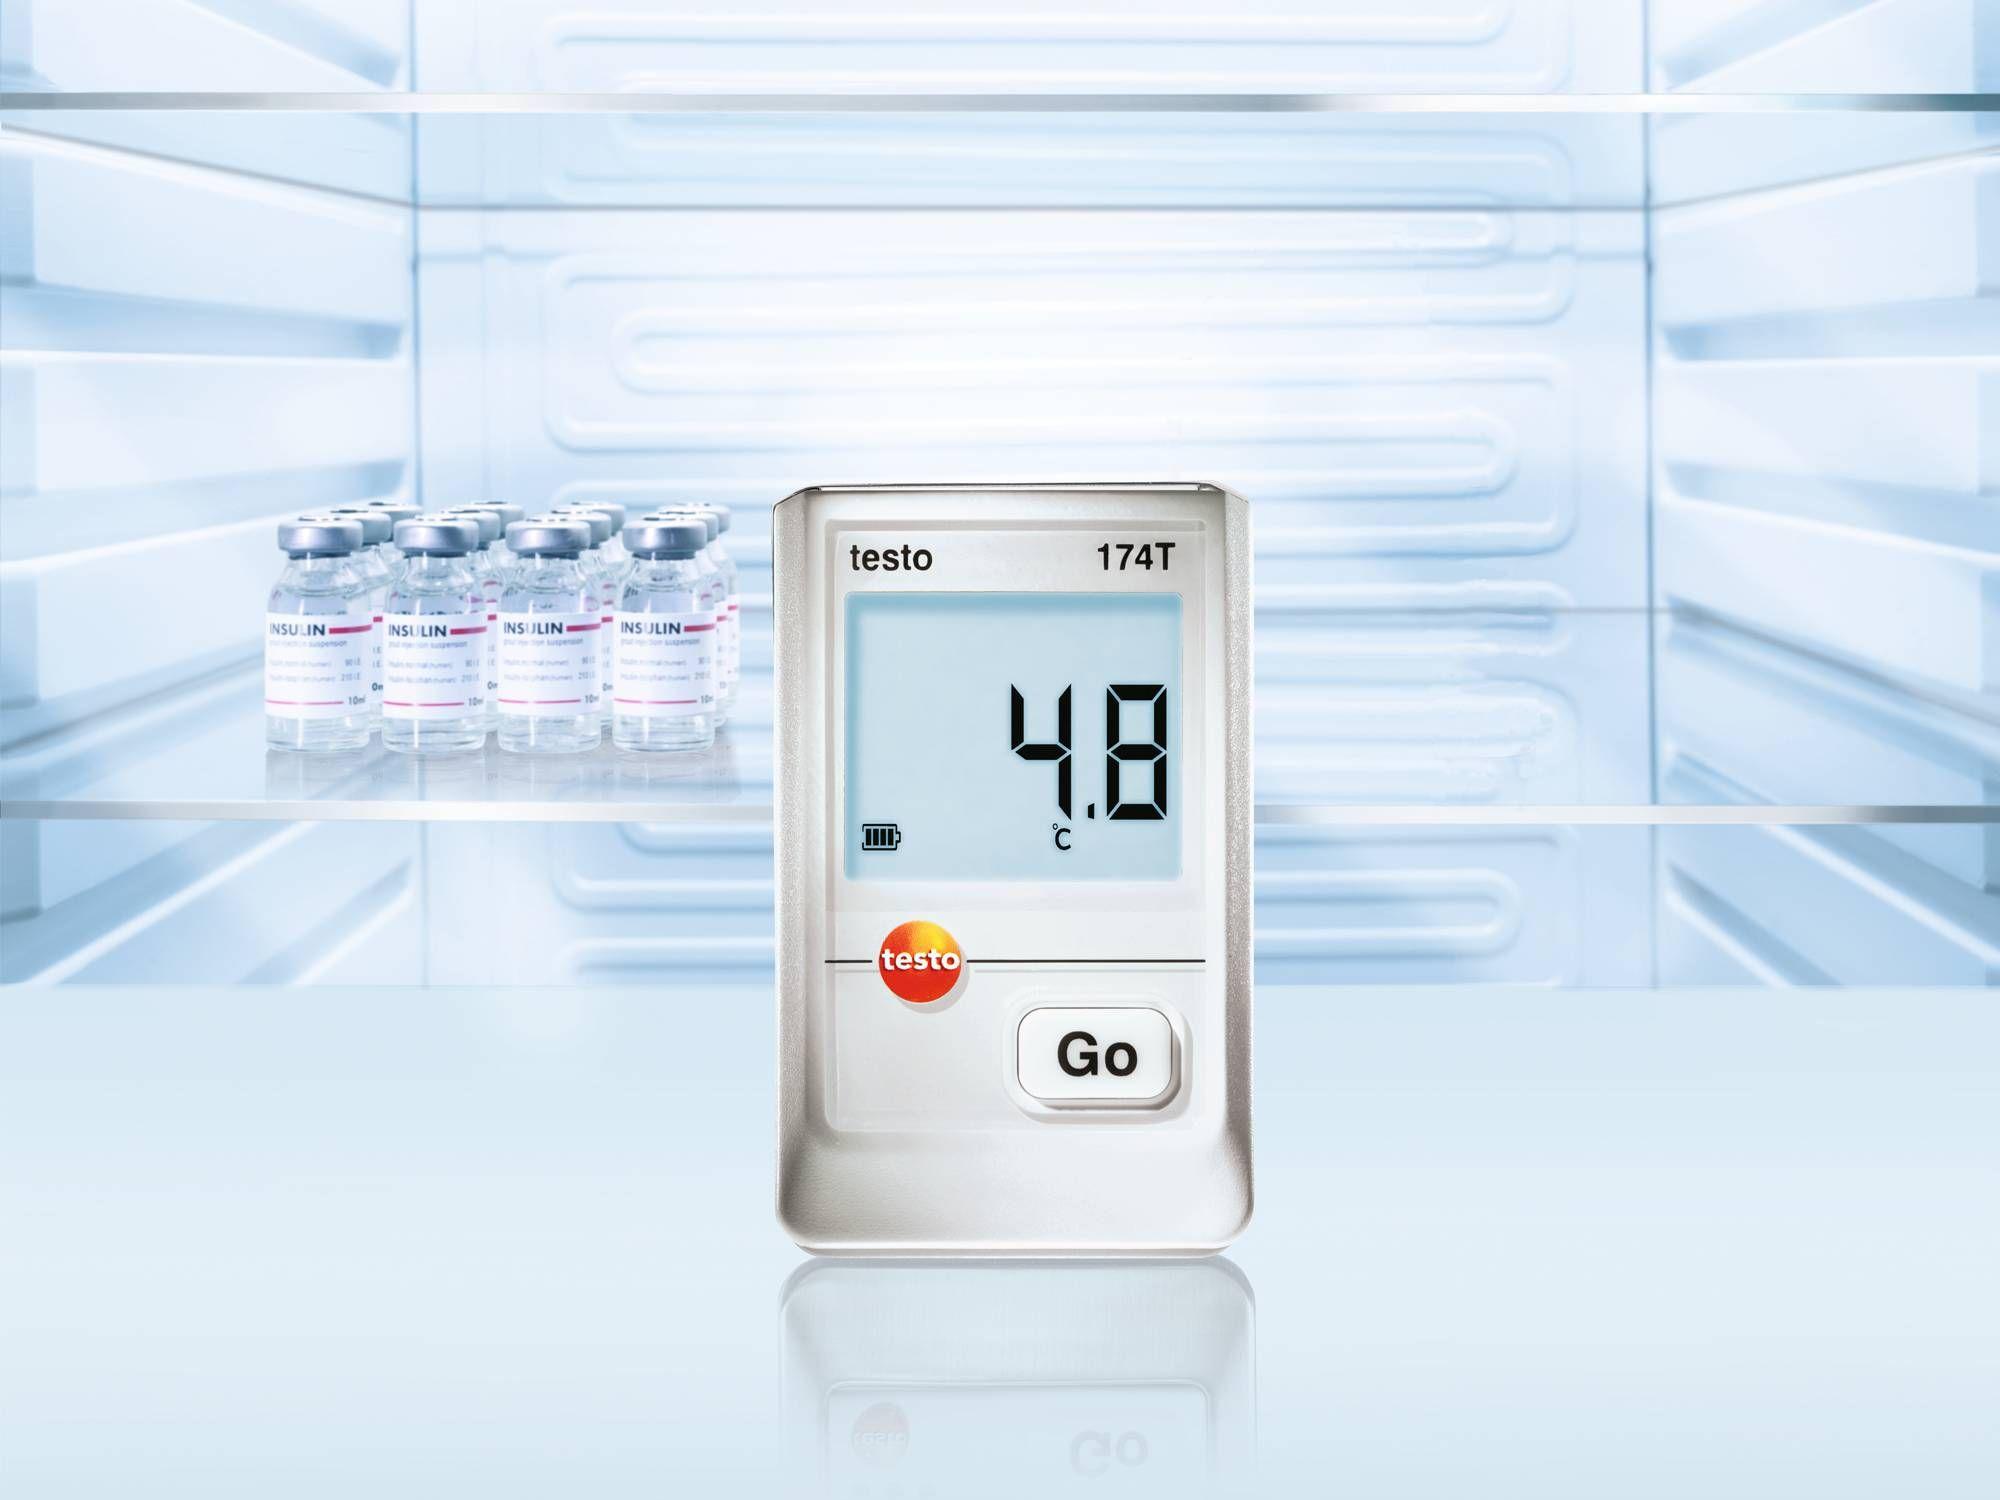 Imag-ES-testo174T-Aplicacion-Farmacia-326dpi.png